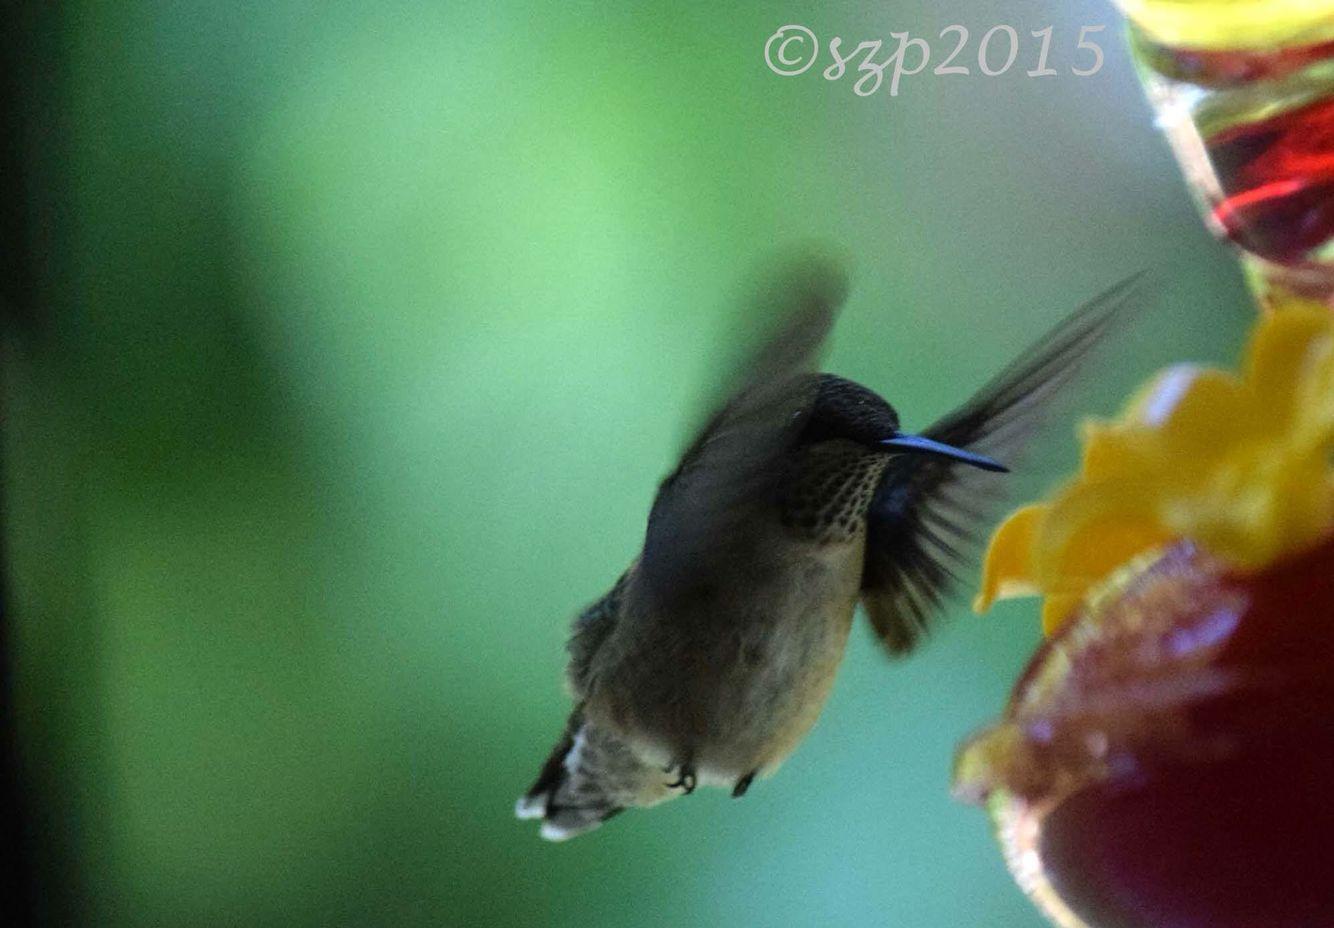 Hummingbird anonymous (With images) Hummingbird, All birds